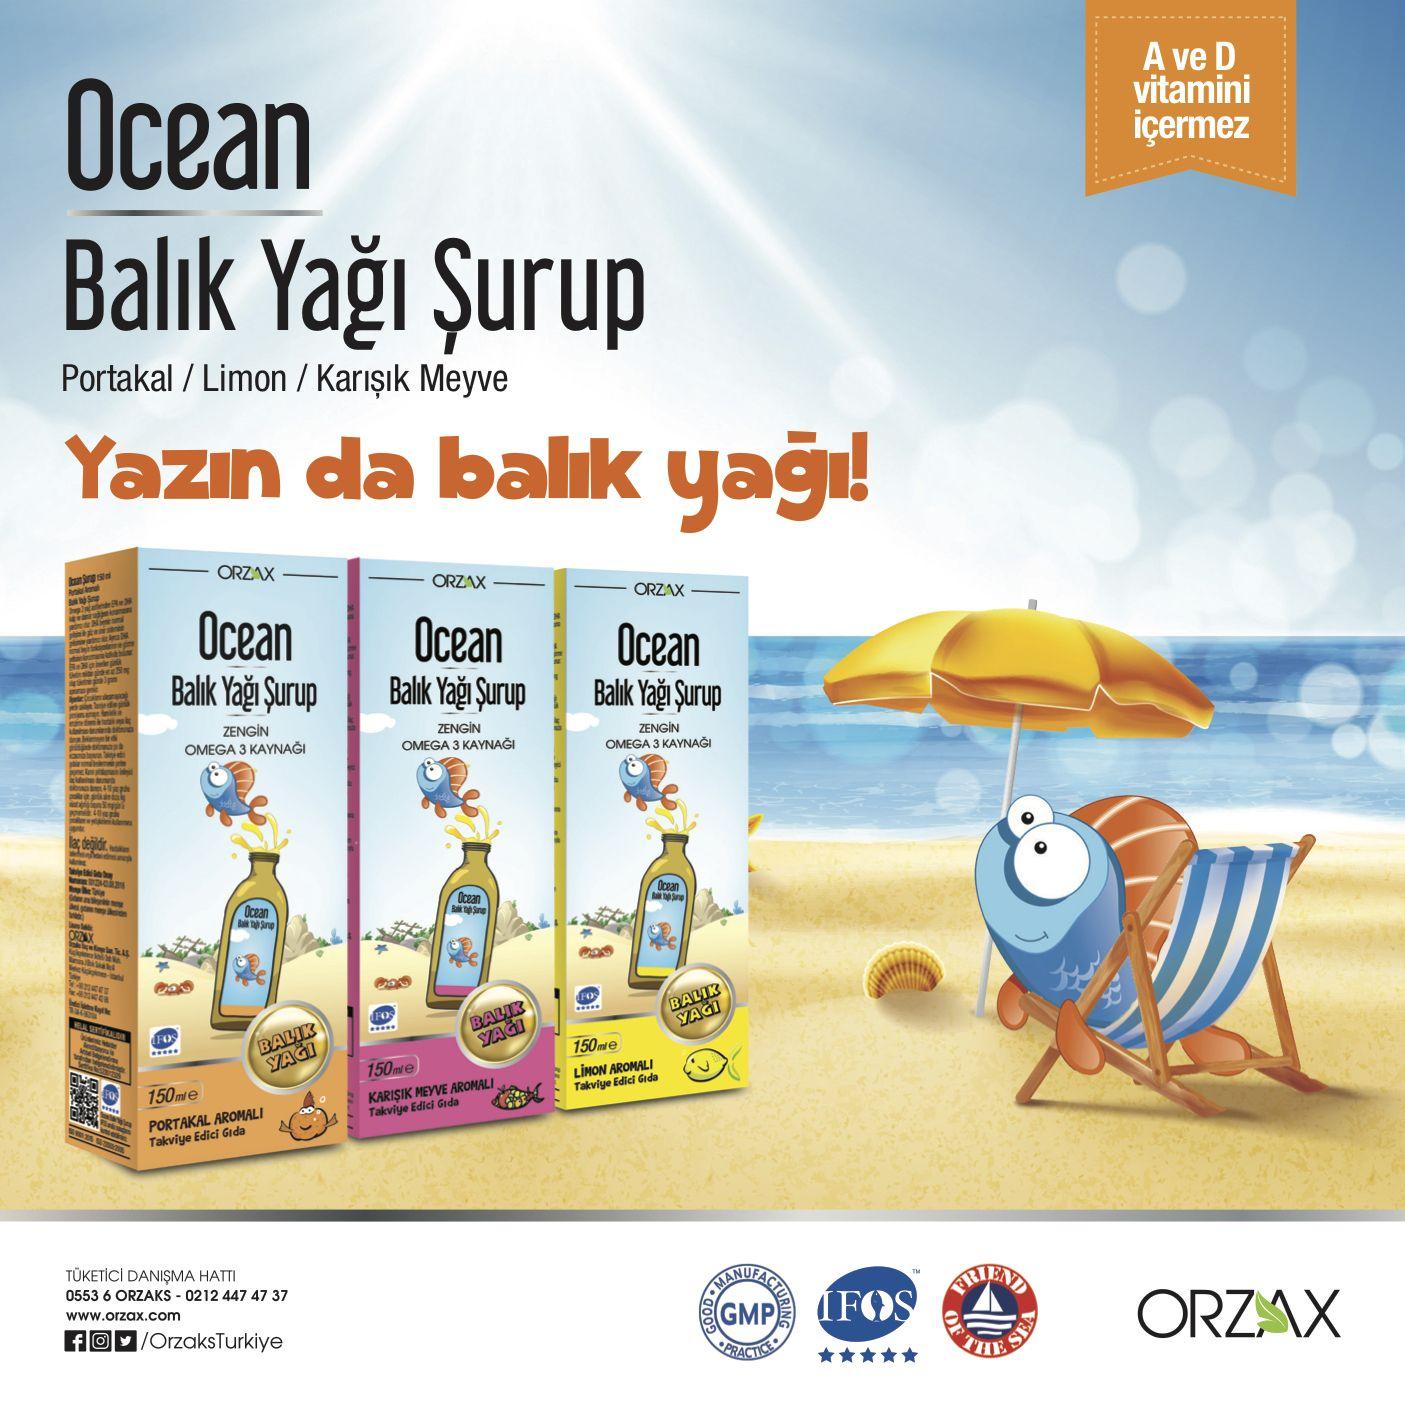 Ocean Balik Yagi Surup Balk Comics Ocean